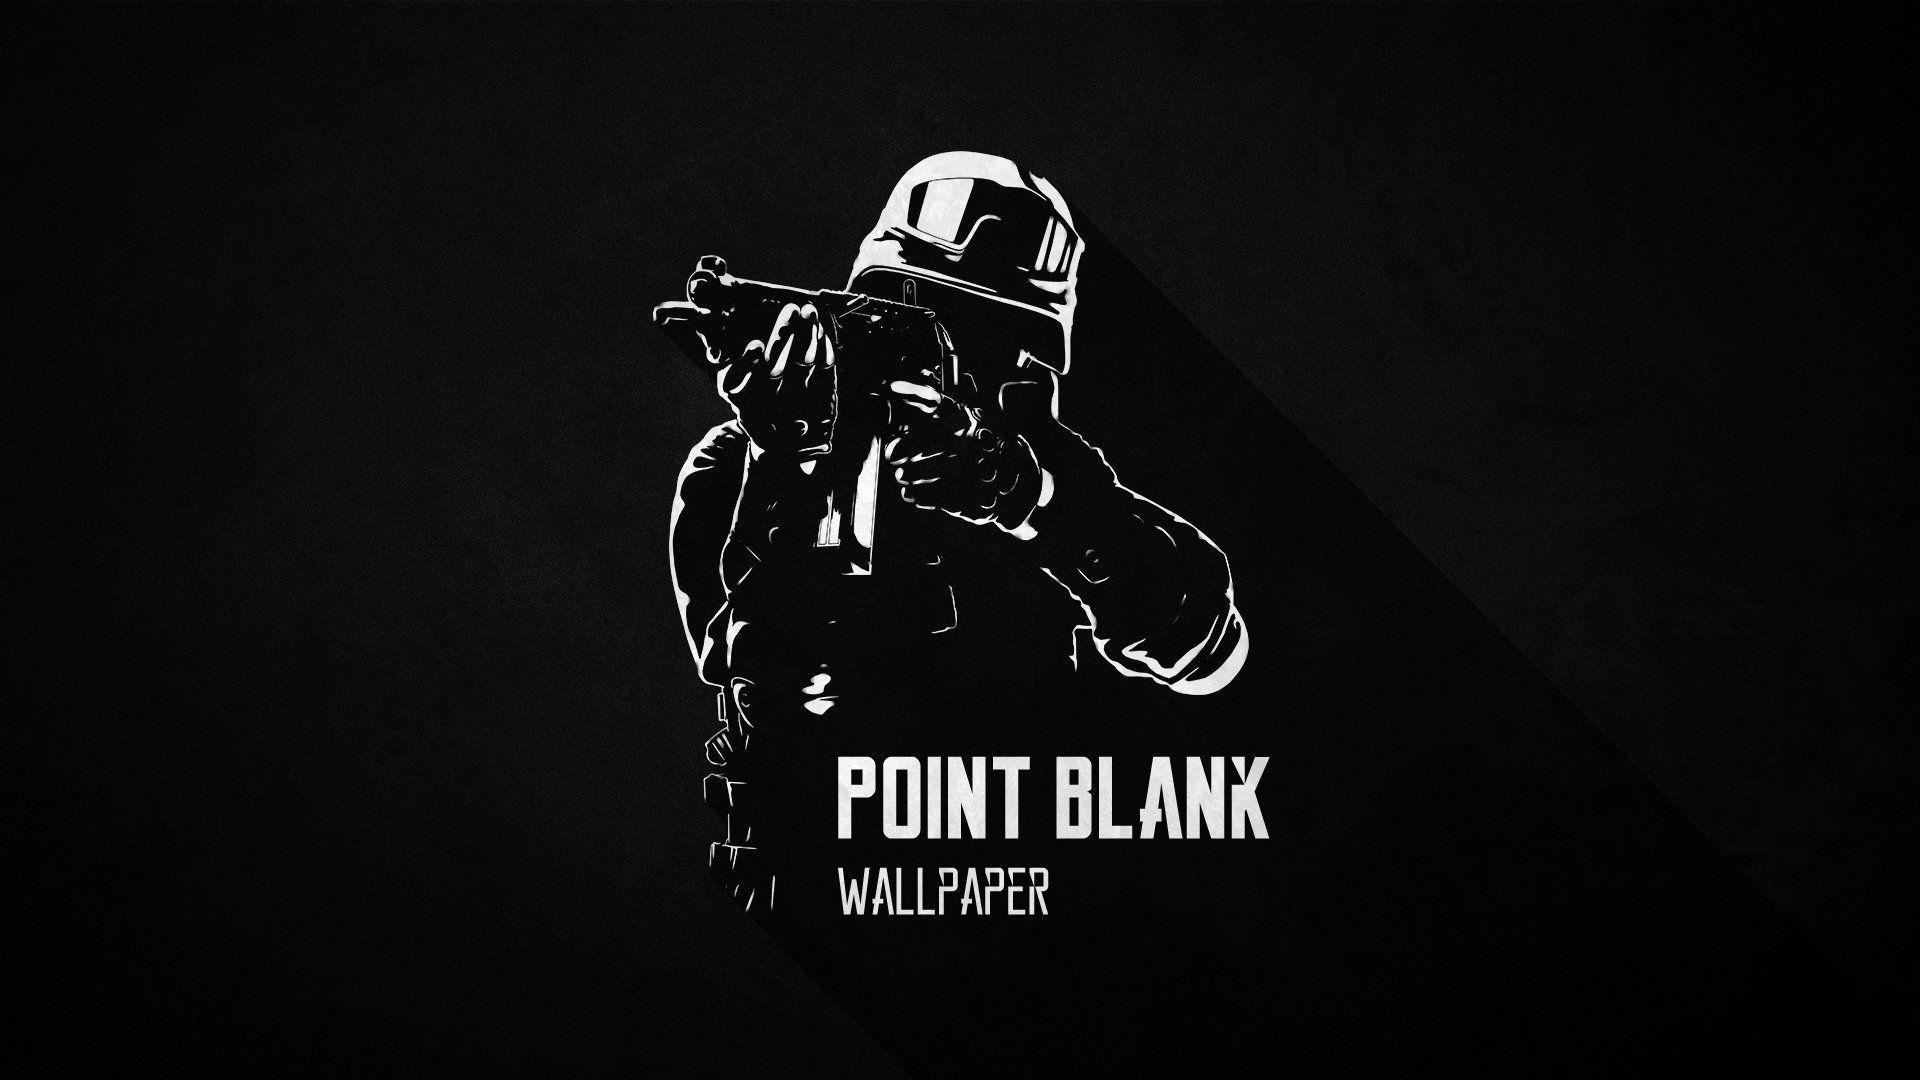 Blank Image